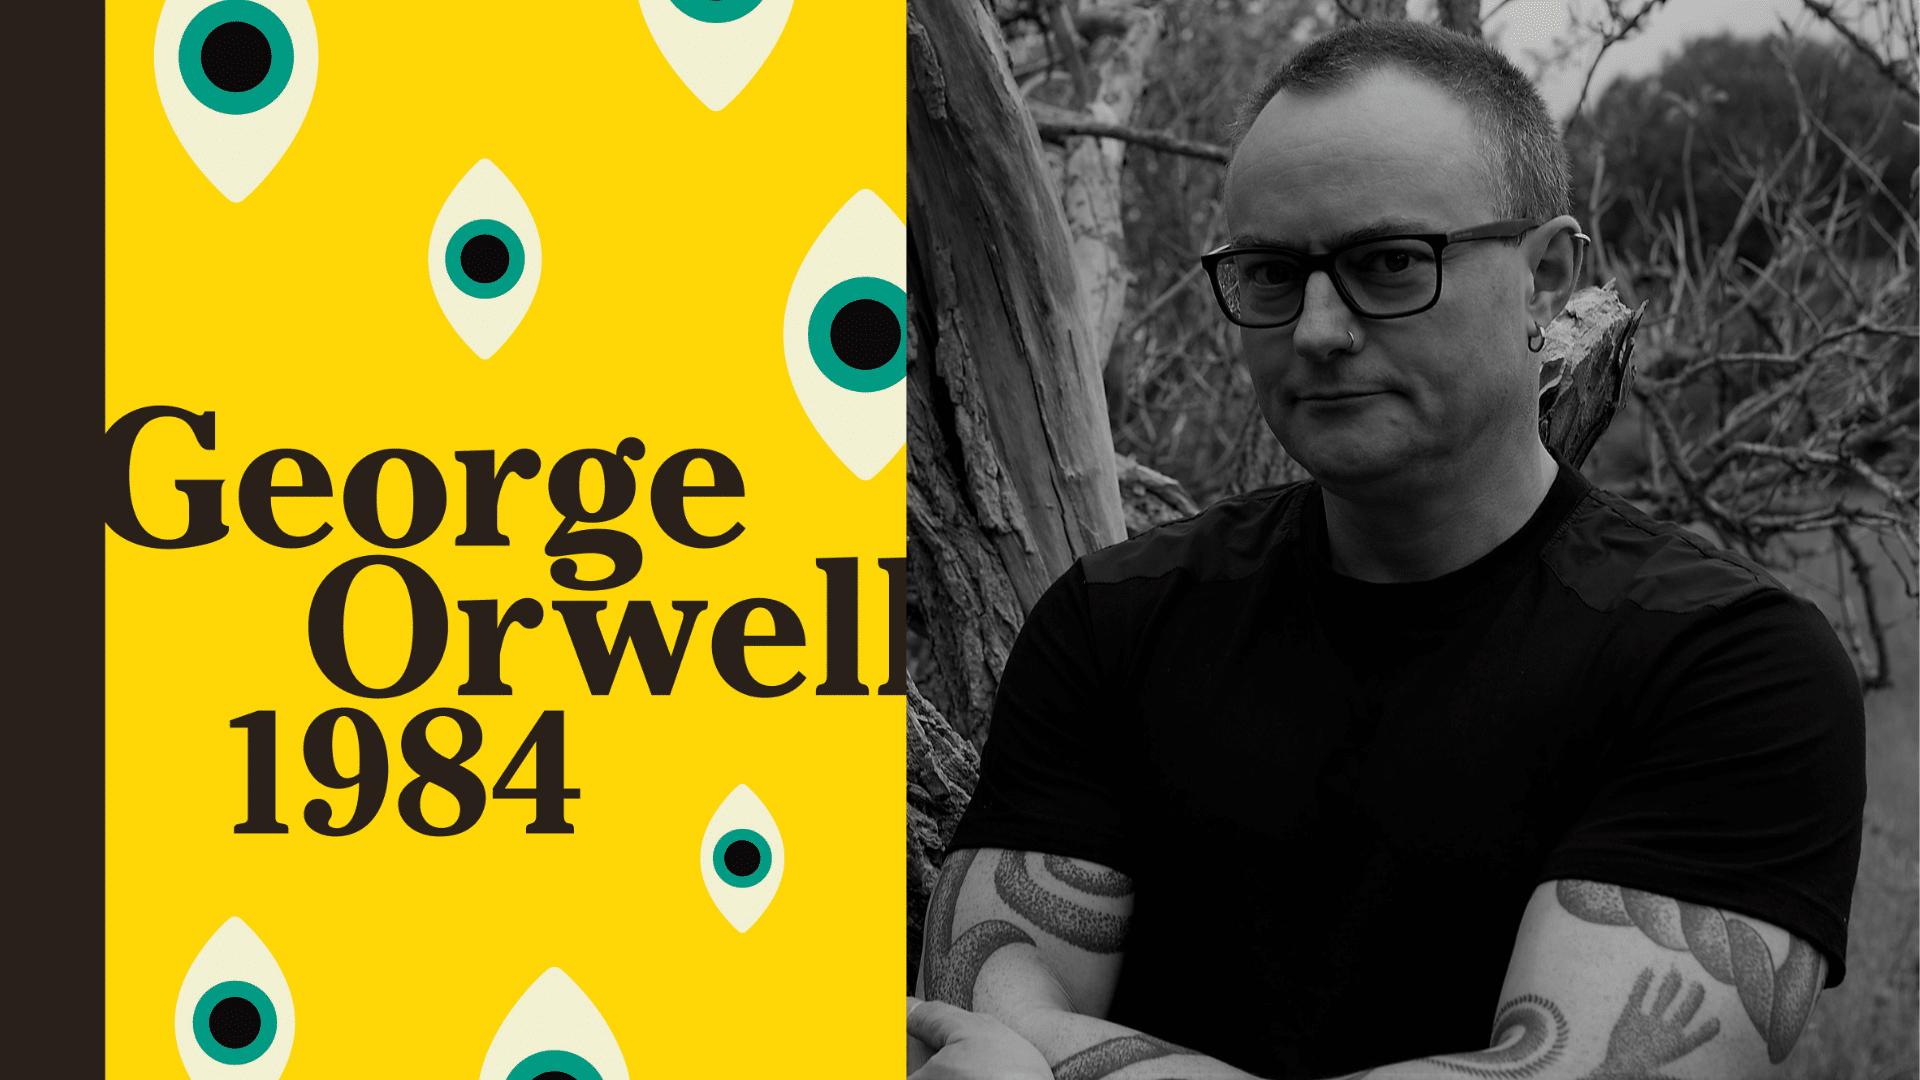 1984, Georgre Orwell, Rasmus Hastrup, Dystopi, Klassiker, Big brother